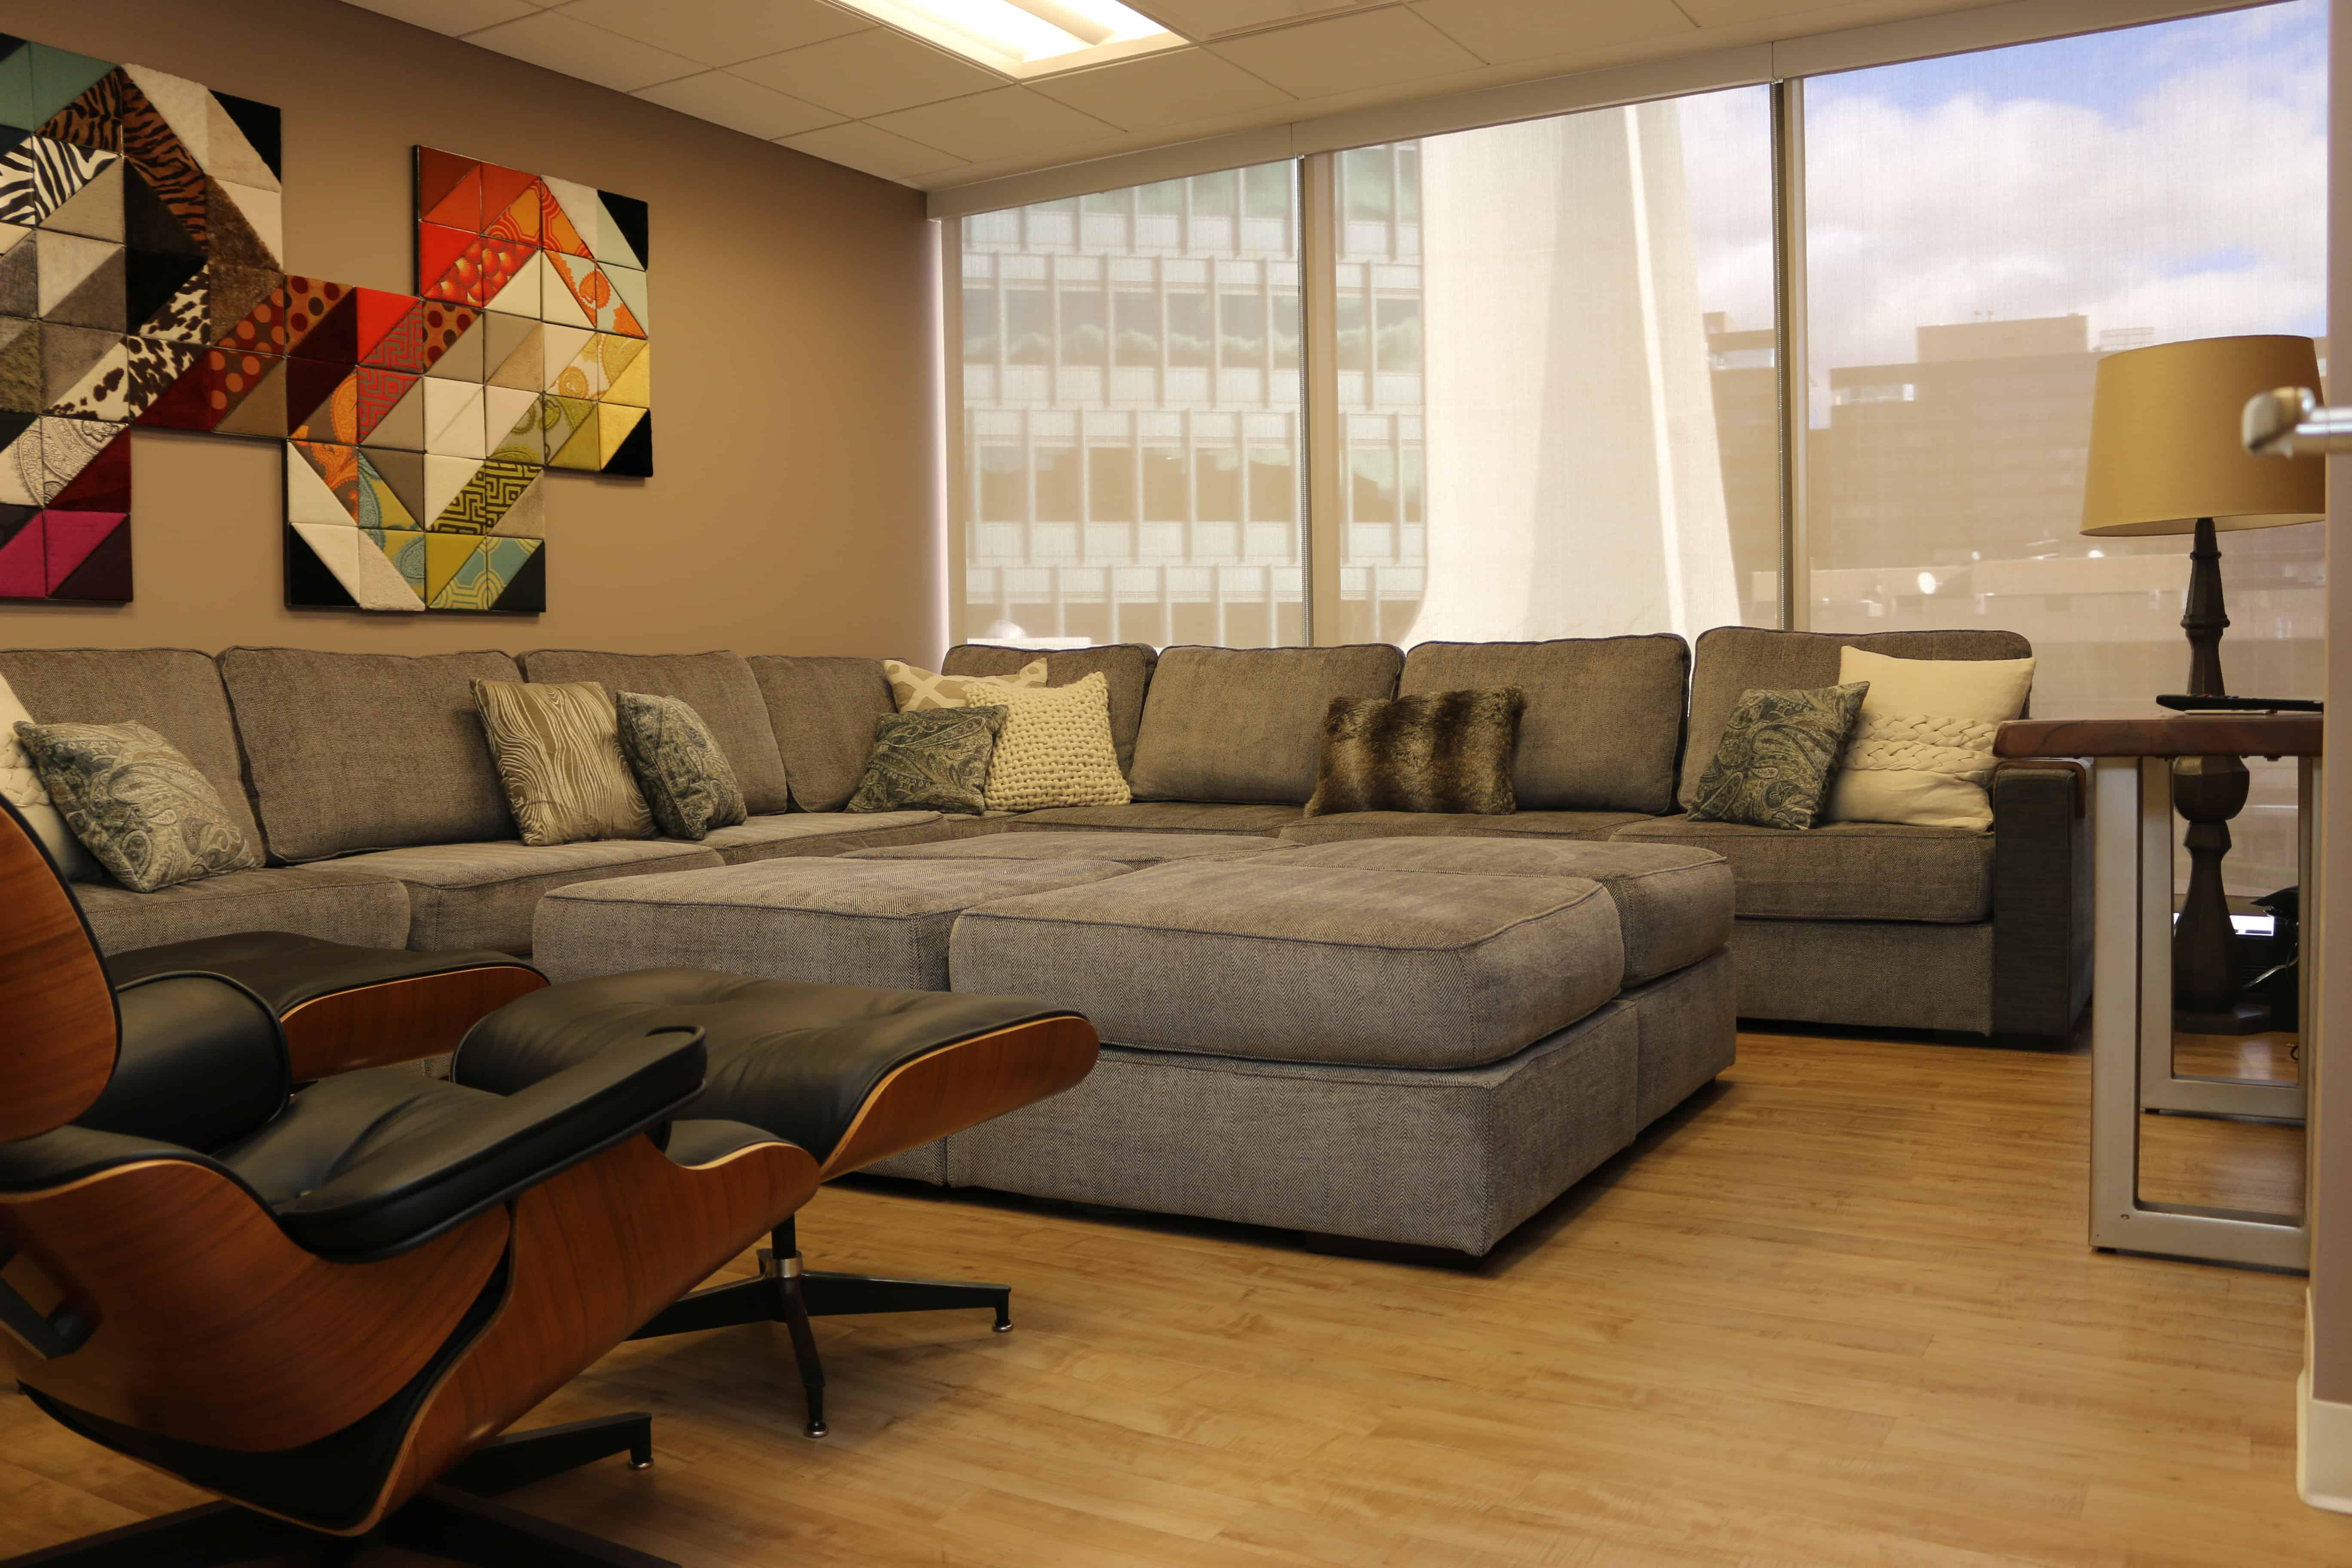 love sac chair full body massage india lovesac living room ideas